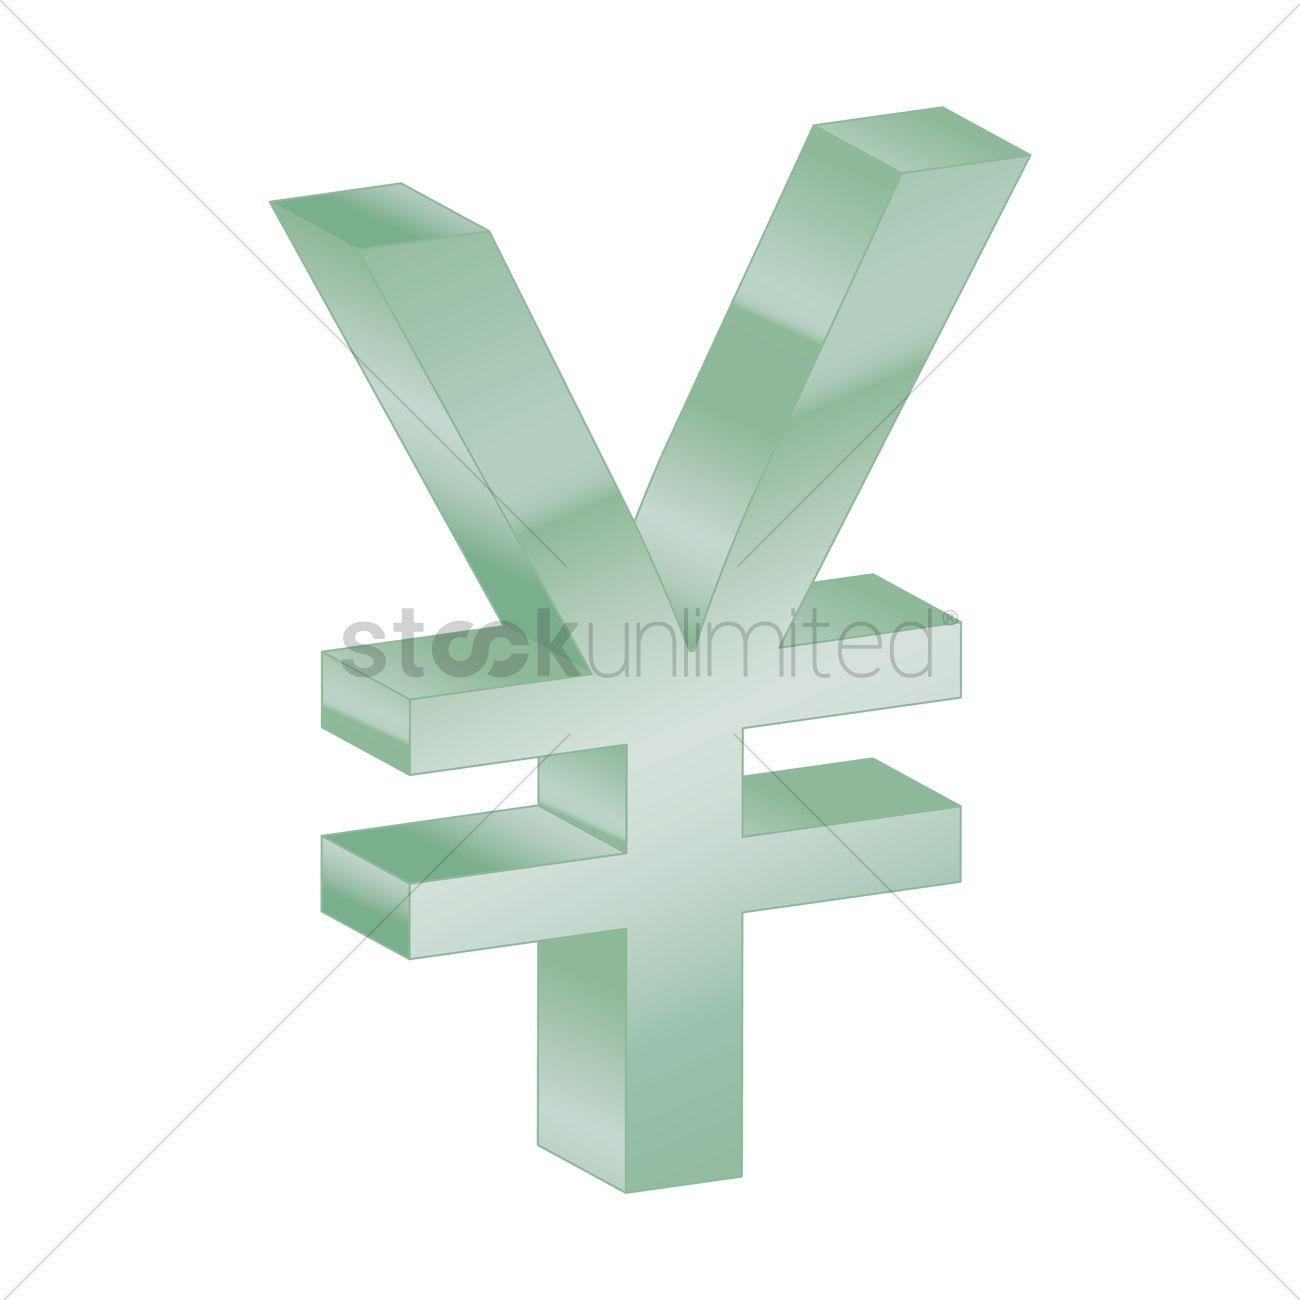 Japanese yen symbol vector image 1866664 stockunlimited japanese yen symbol vector graphic biocorpaavc Choice Image